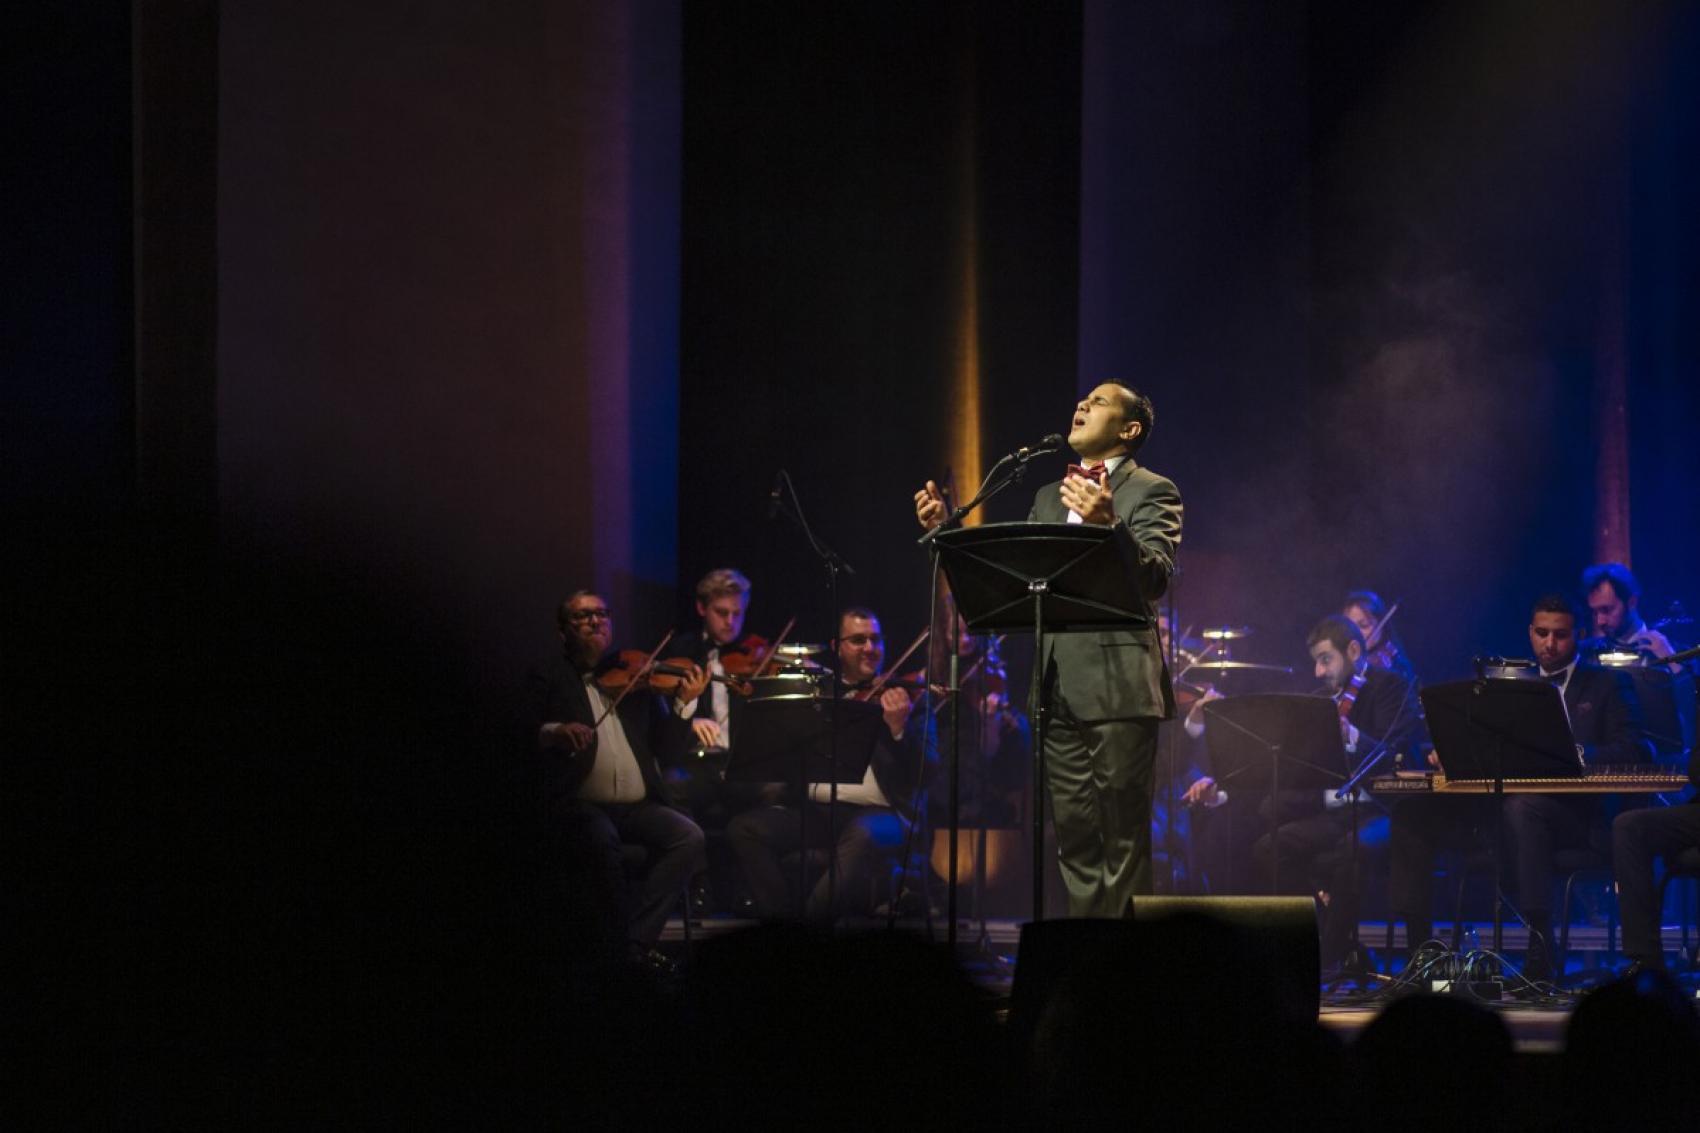 Amsterdams Andalusisch Orkest en Nederlands Kamerorkest